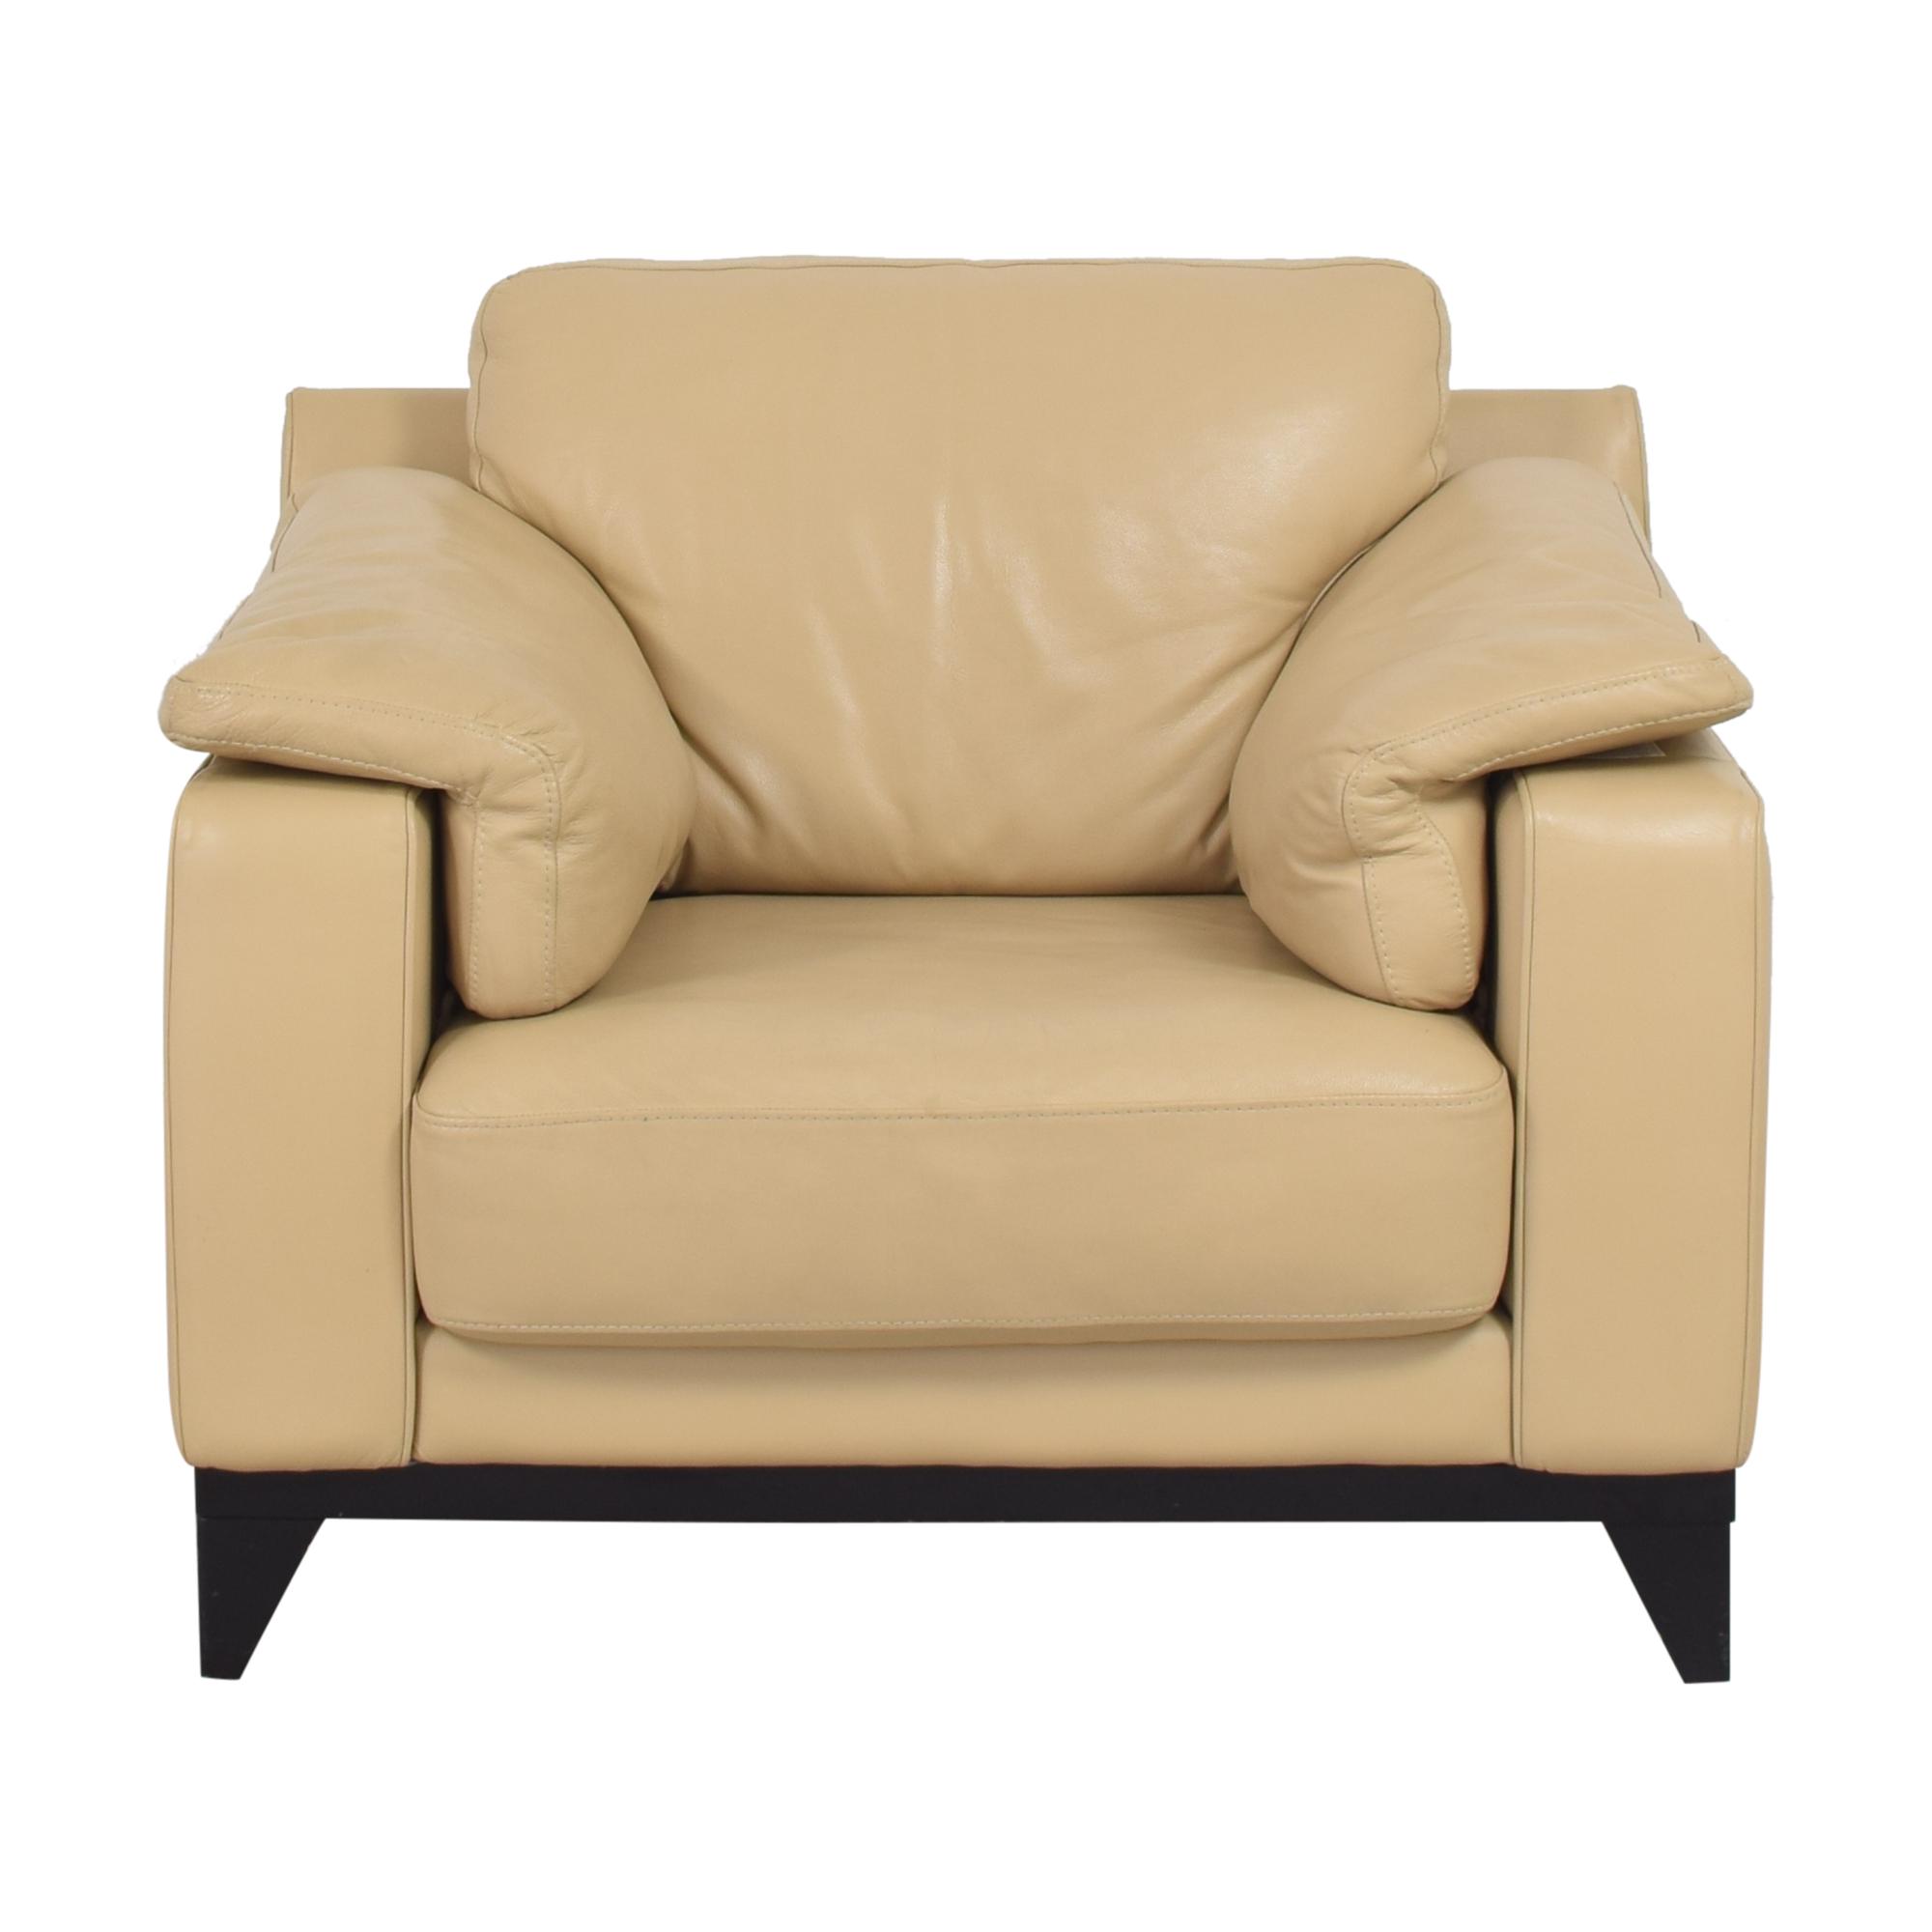 buy Nicoletti Home Accent Chair Nicoletti Home Sofas